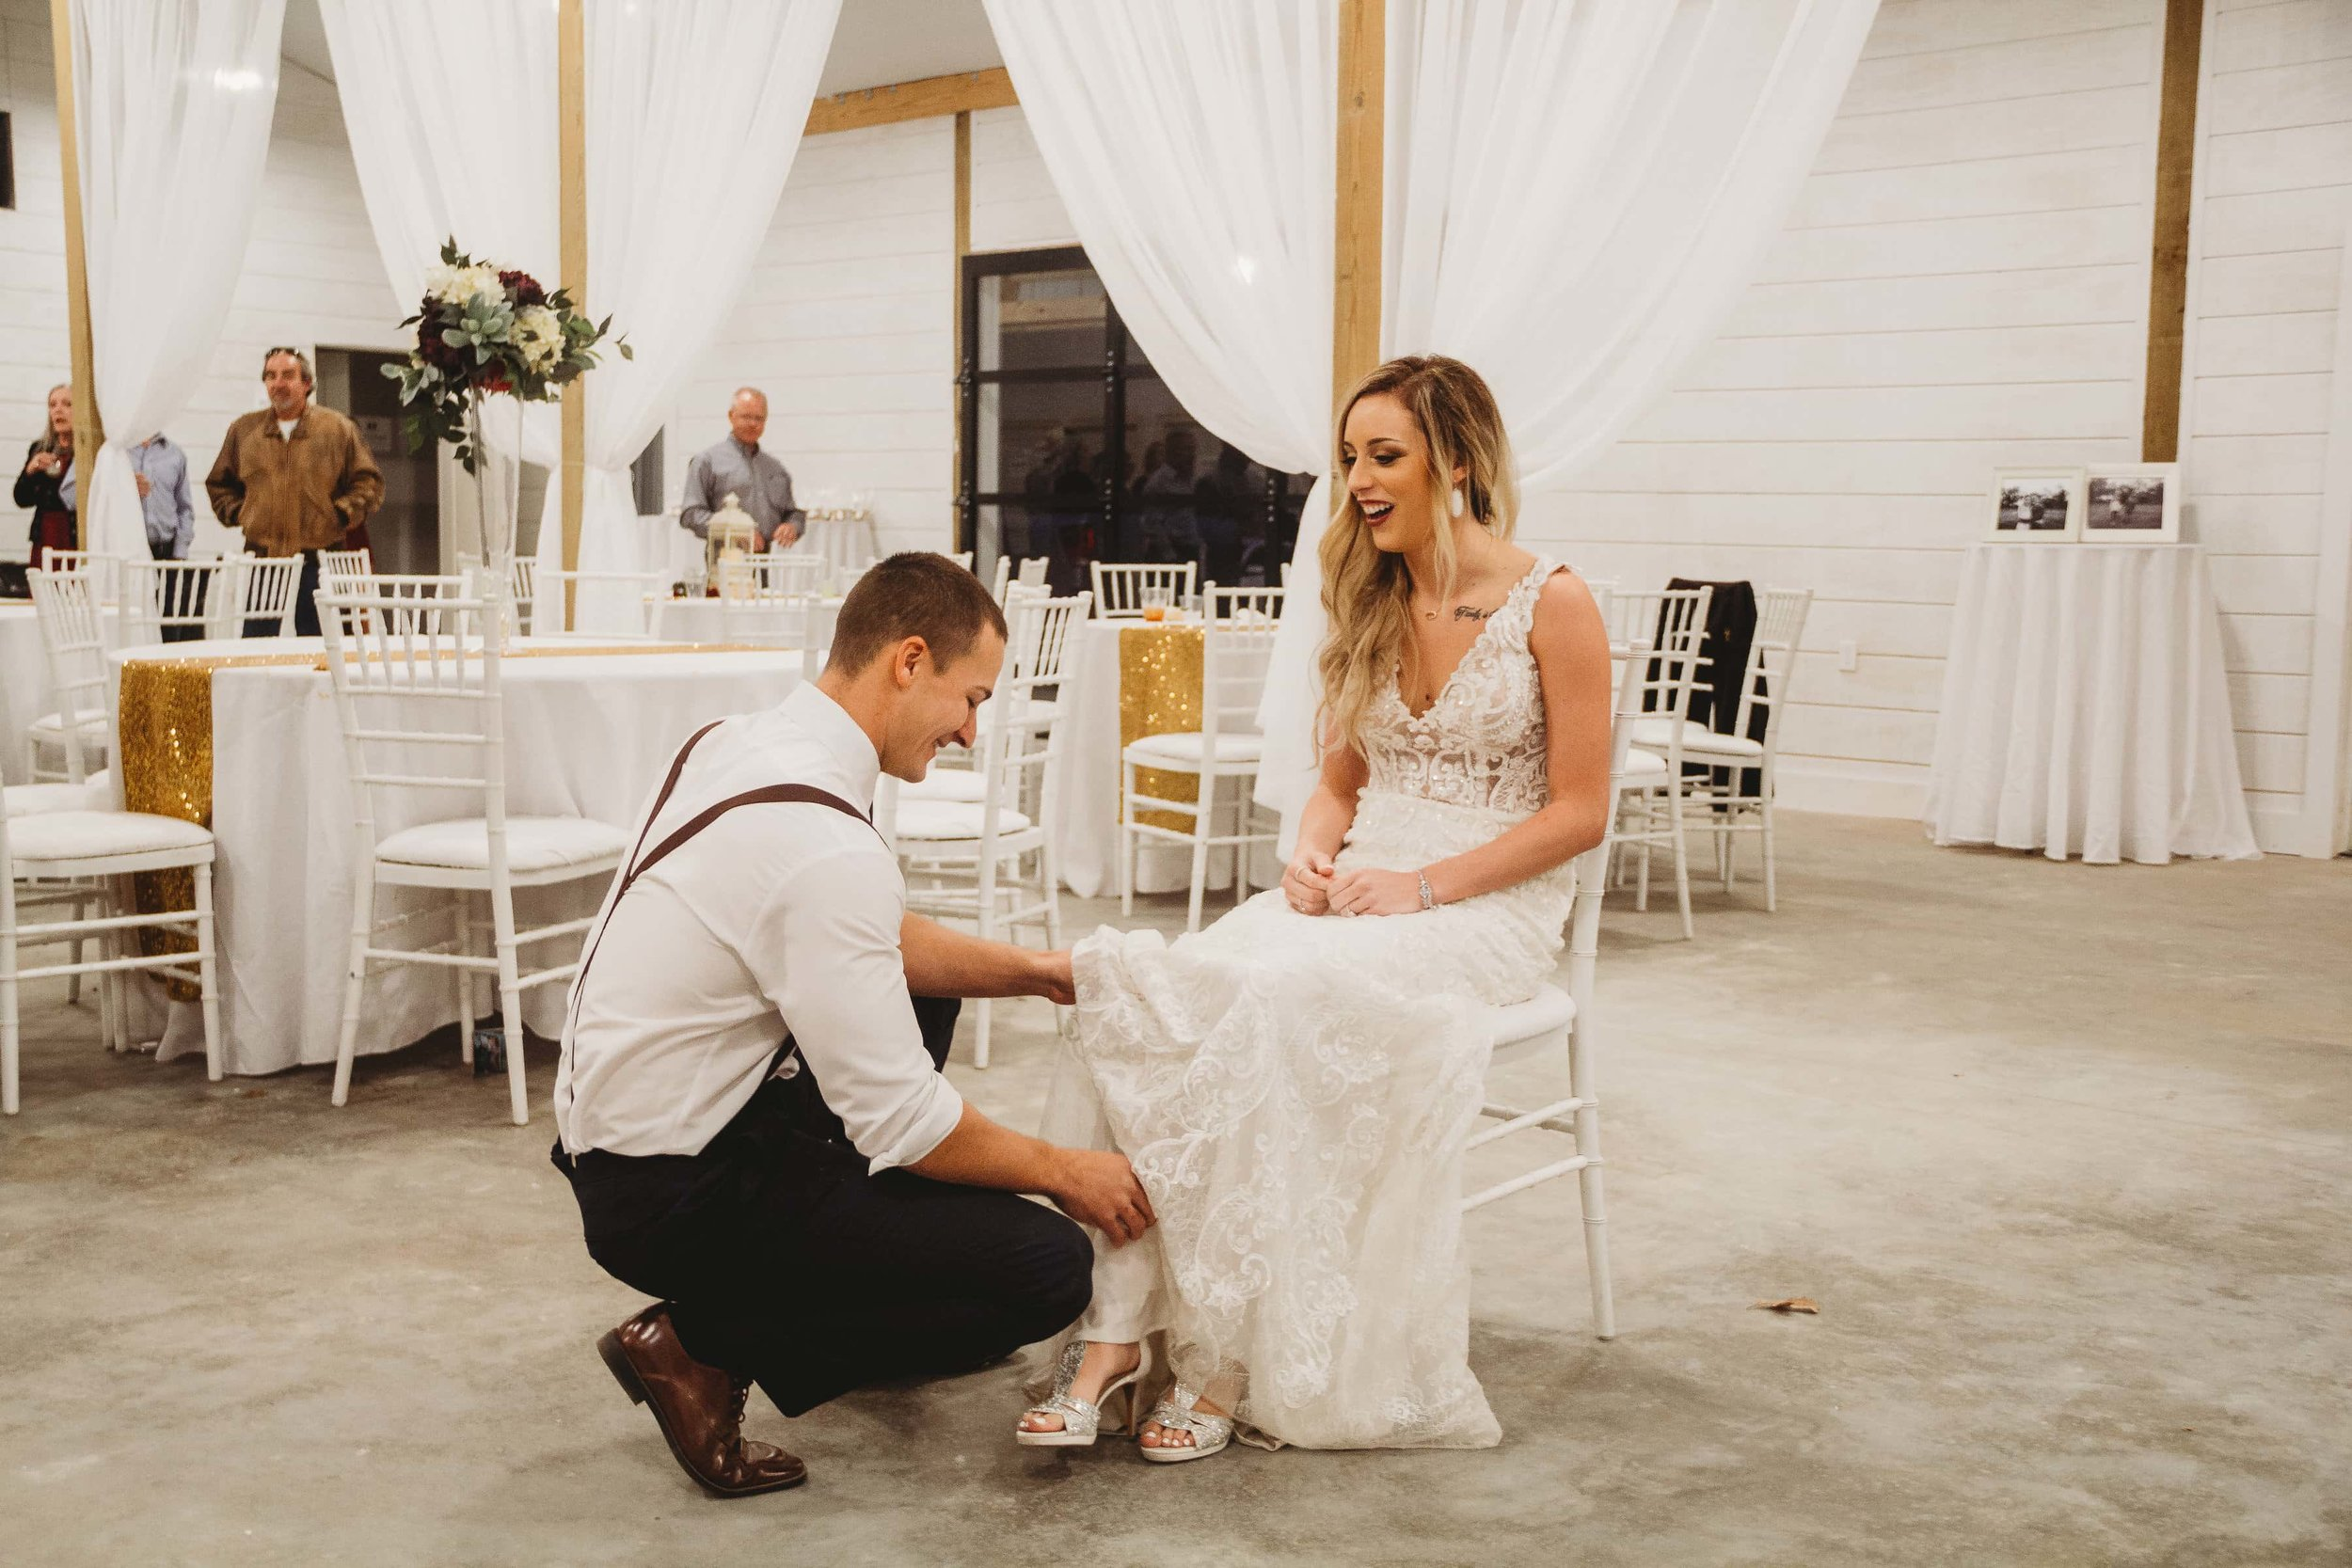 Outdoor Wedding Venue Tulsa 9-min.jpg